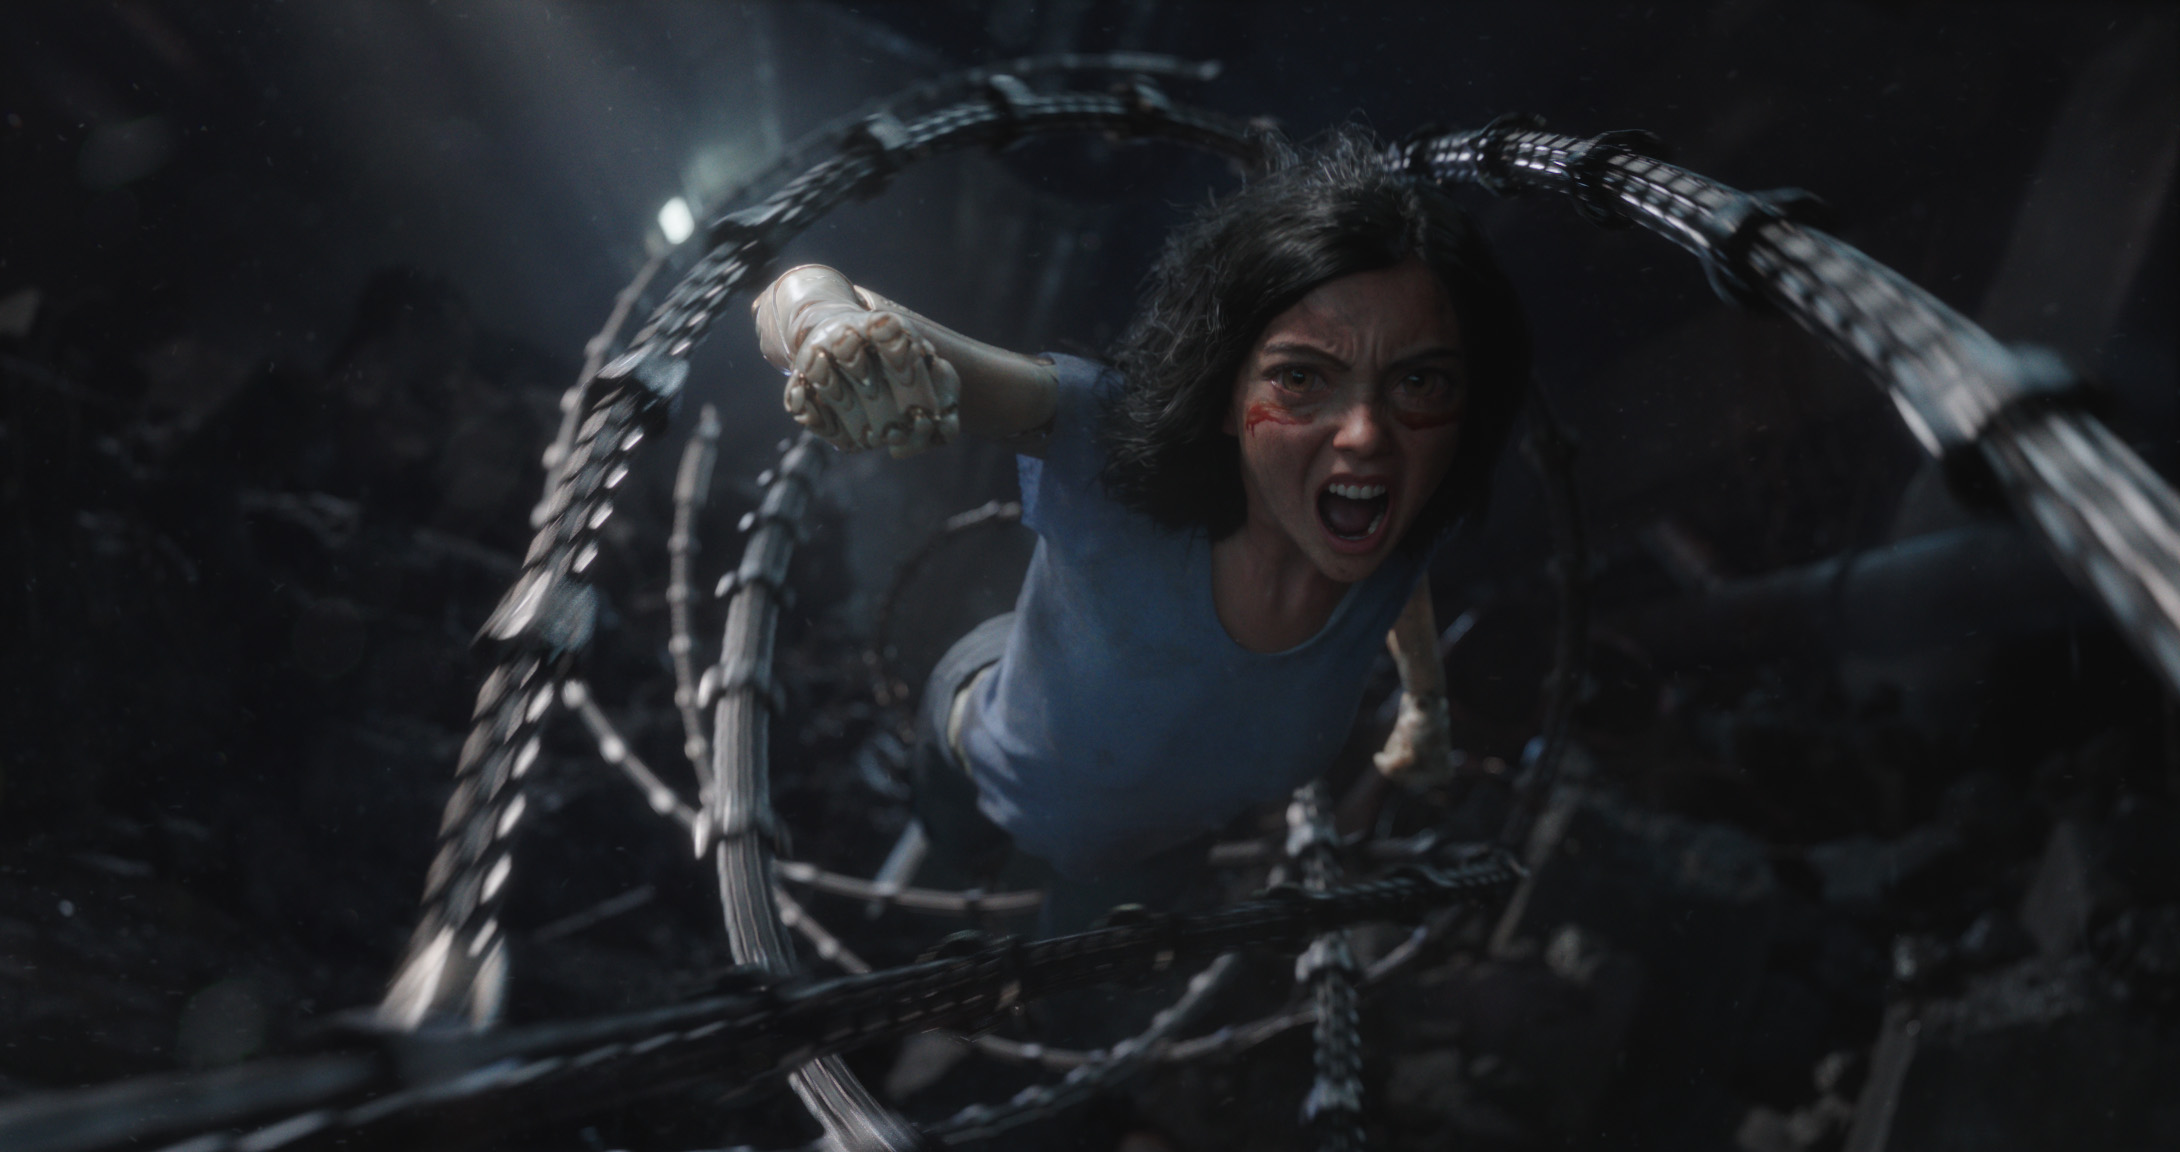 Rosa Salazar as Alita in motion capture - ALITA BATTLE ANGEL.jpg